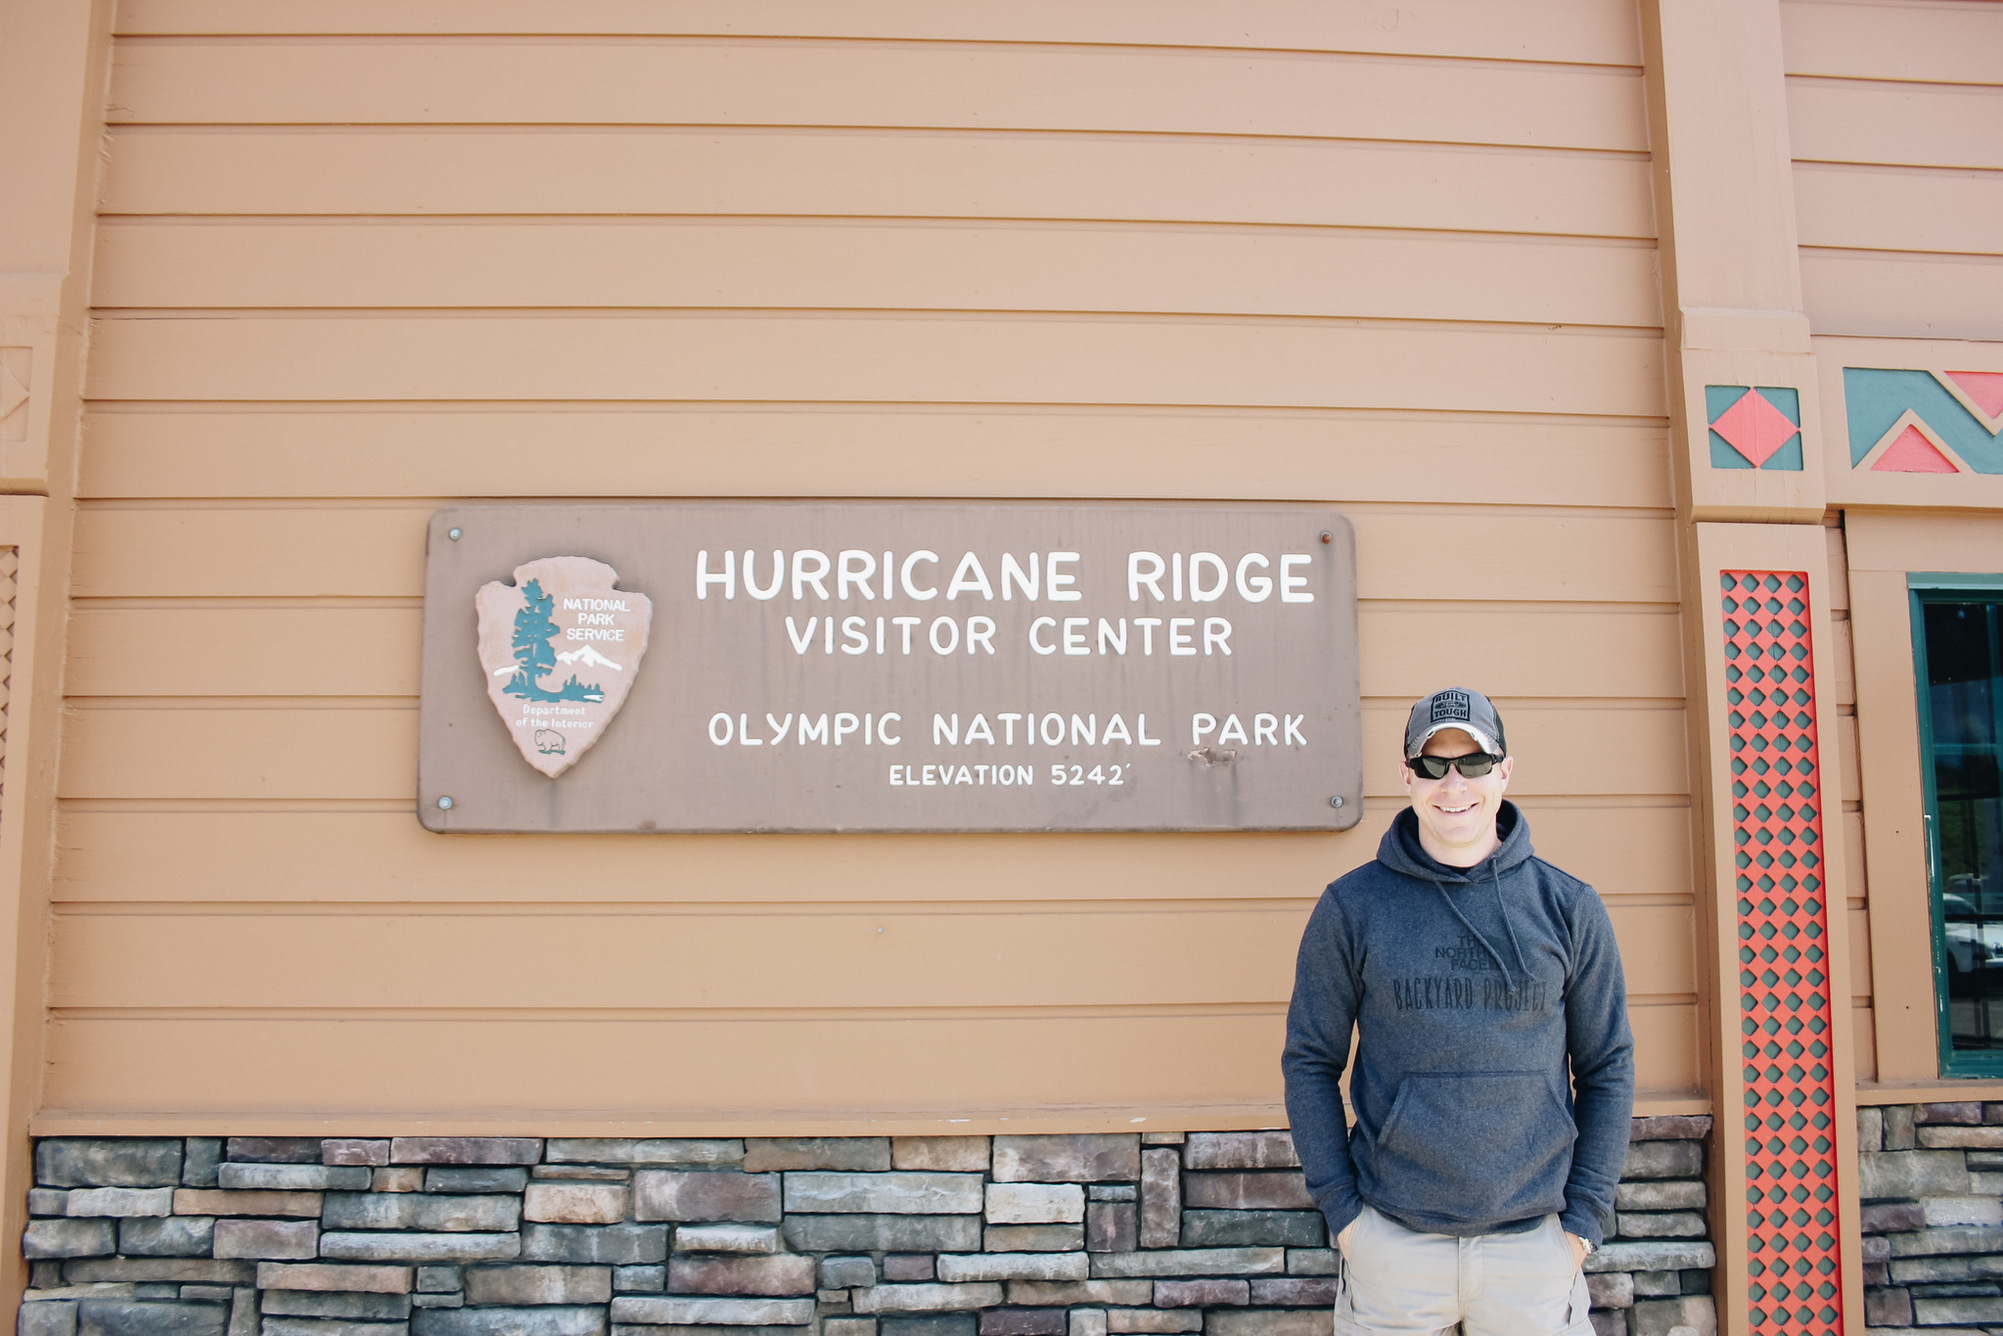 hurricane ridge visitor center, washington